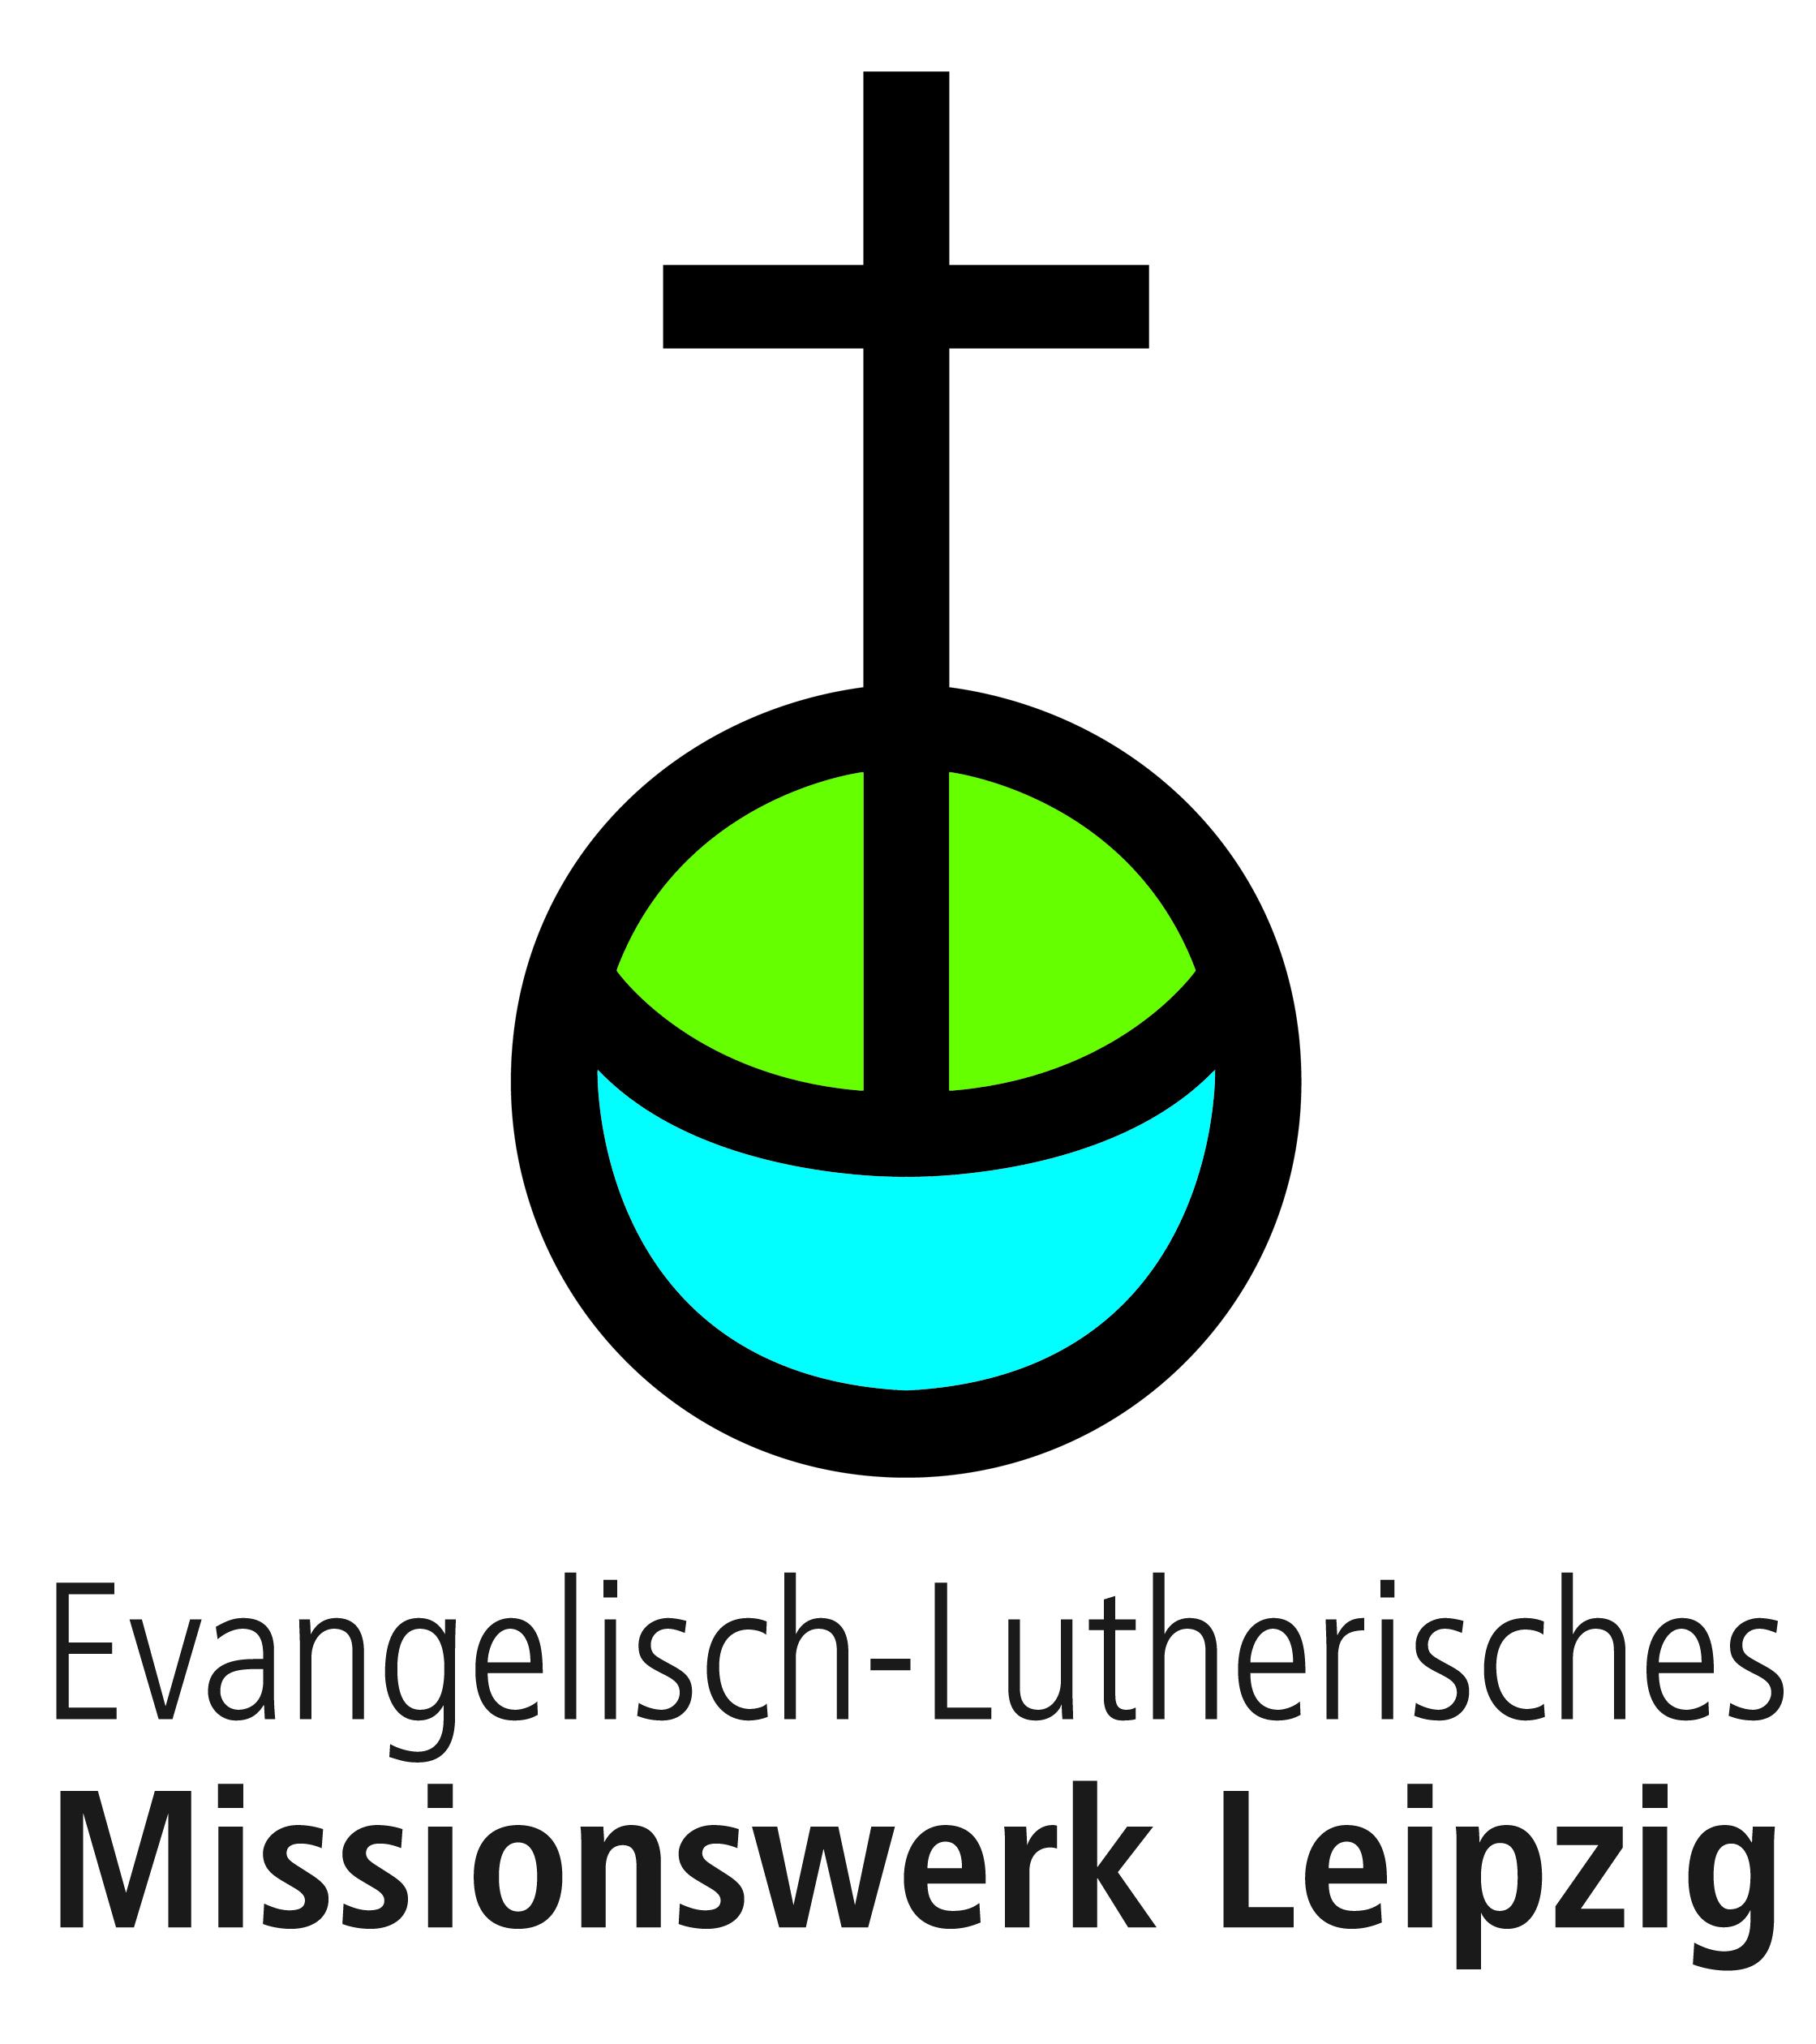 Leipziger Missionswerks (sponsor)